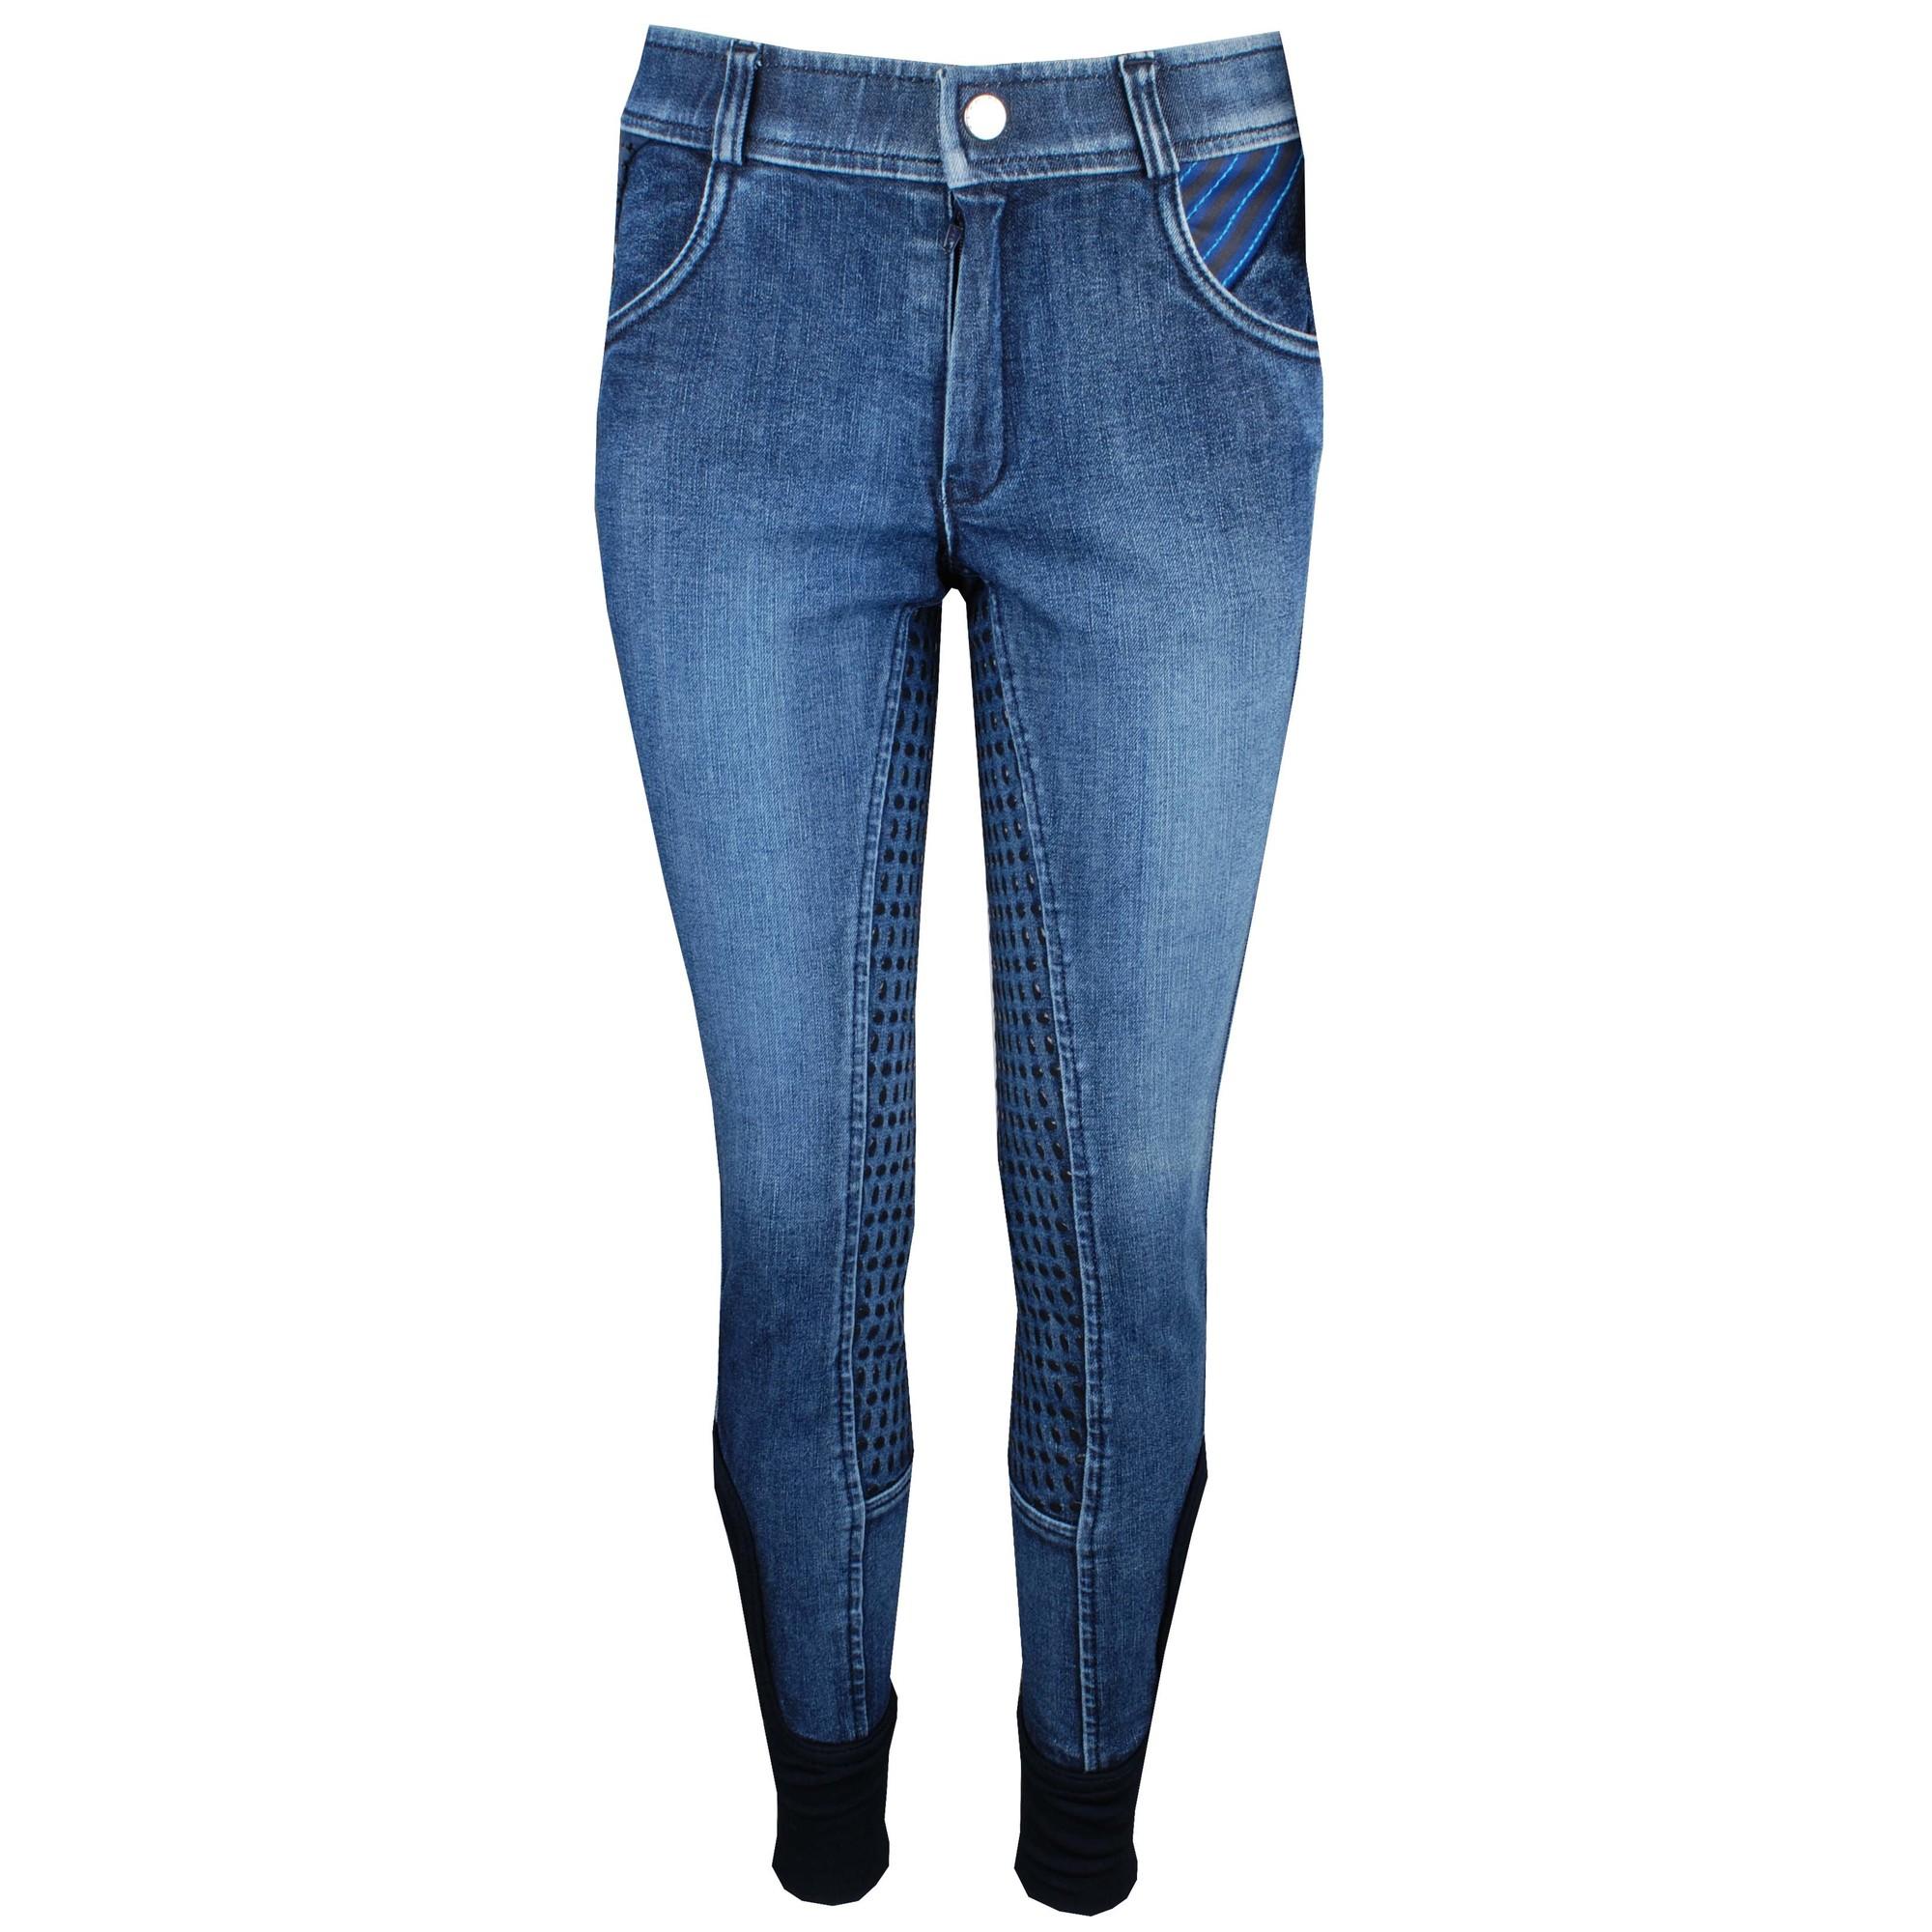 Harrys Horse Loulou Bowhill kinder rijbroek jeans maat:128